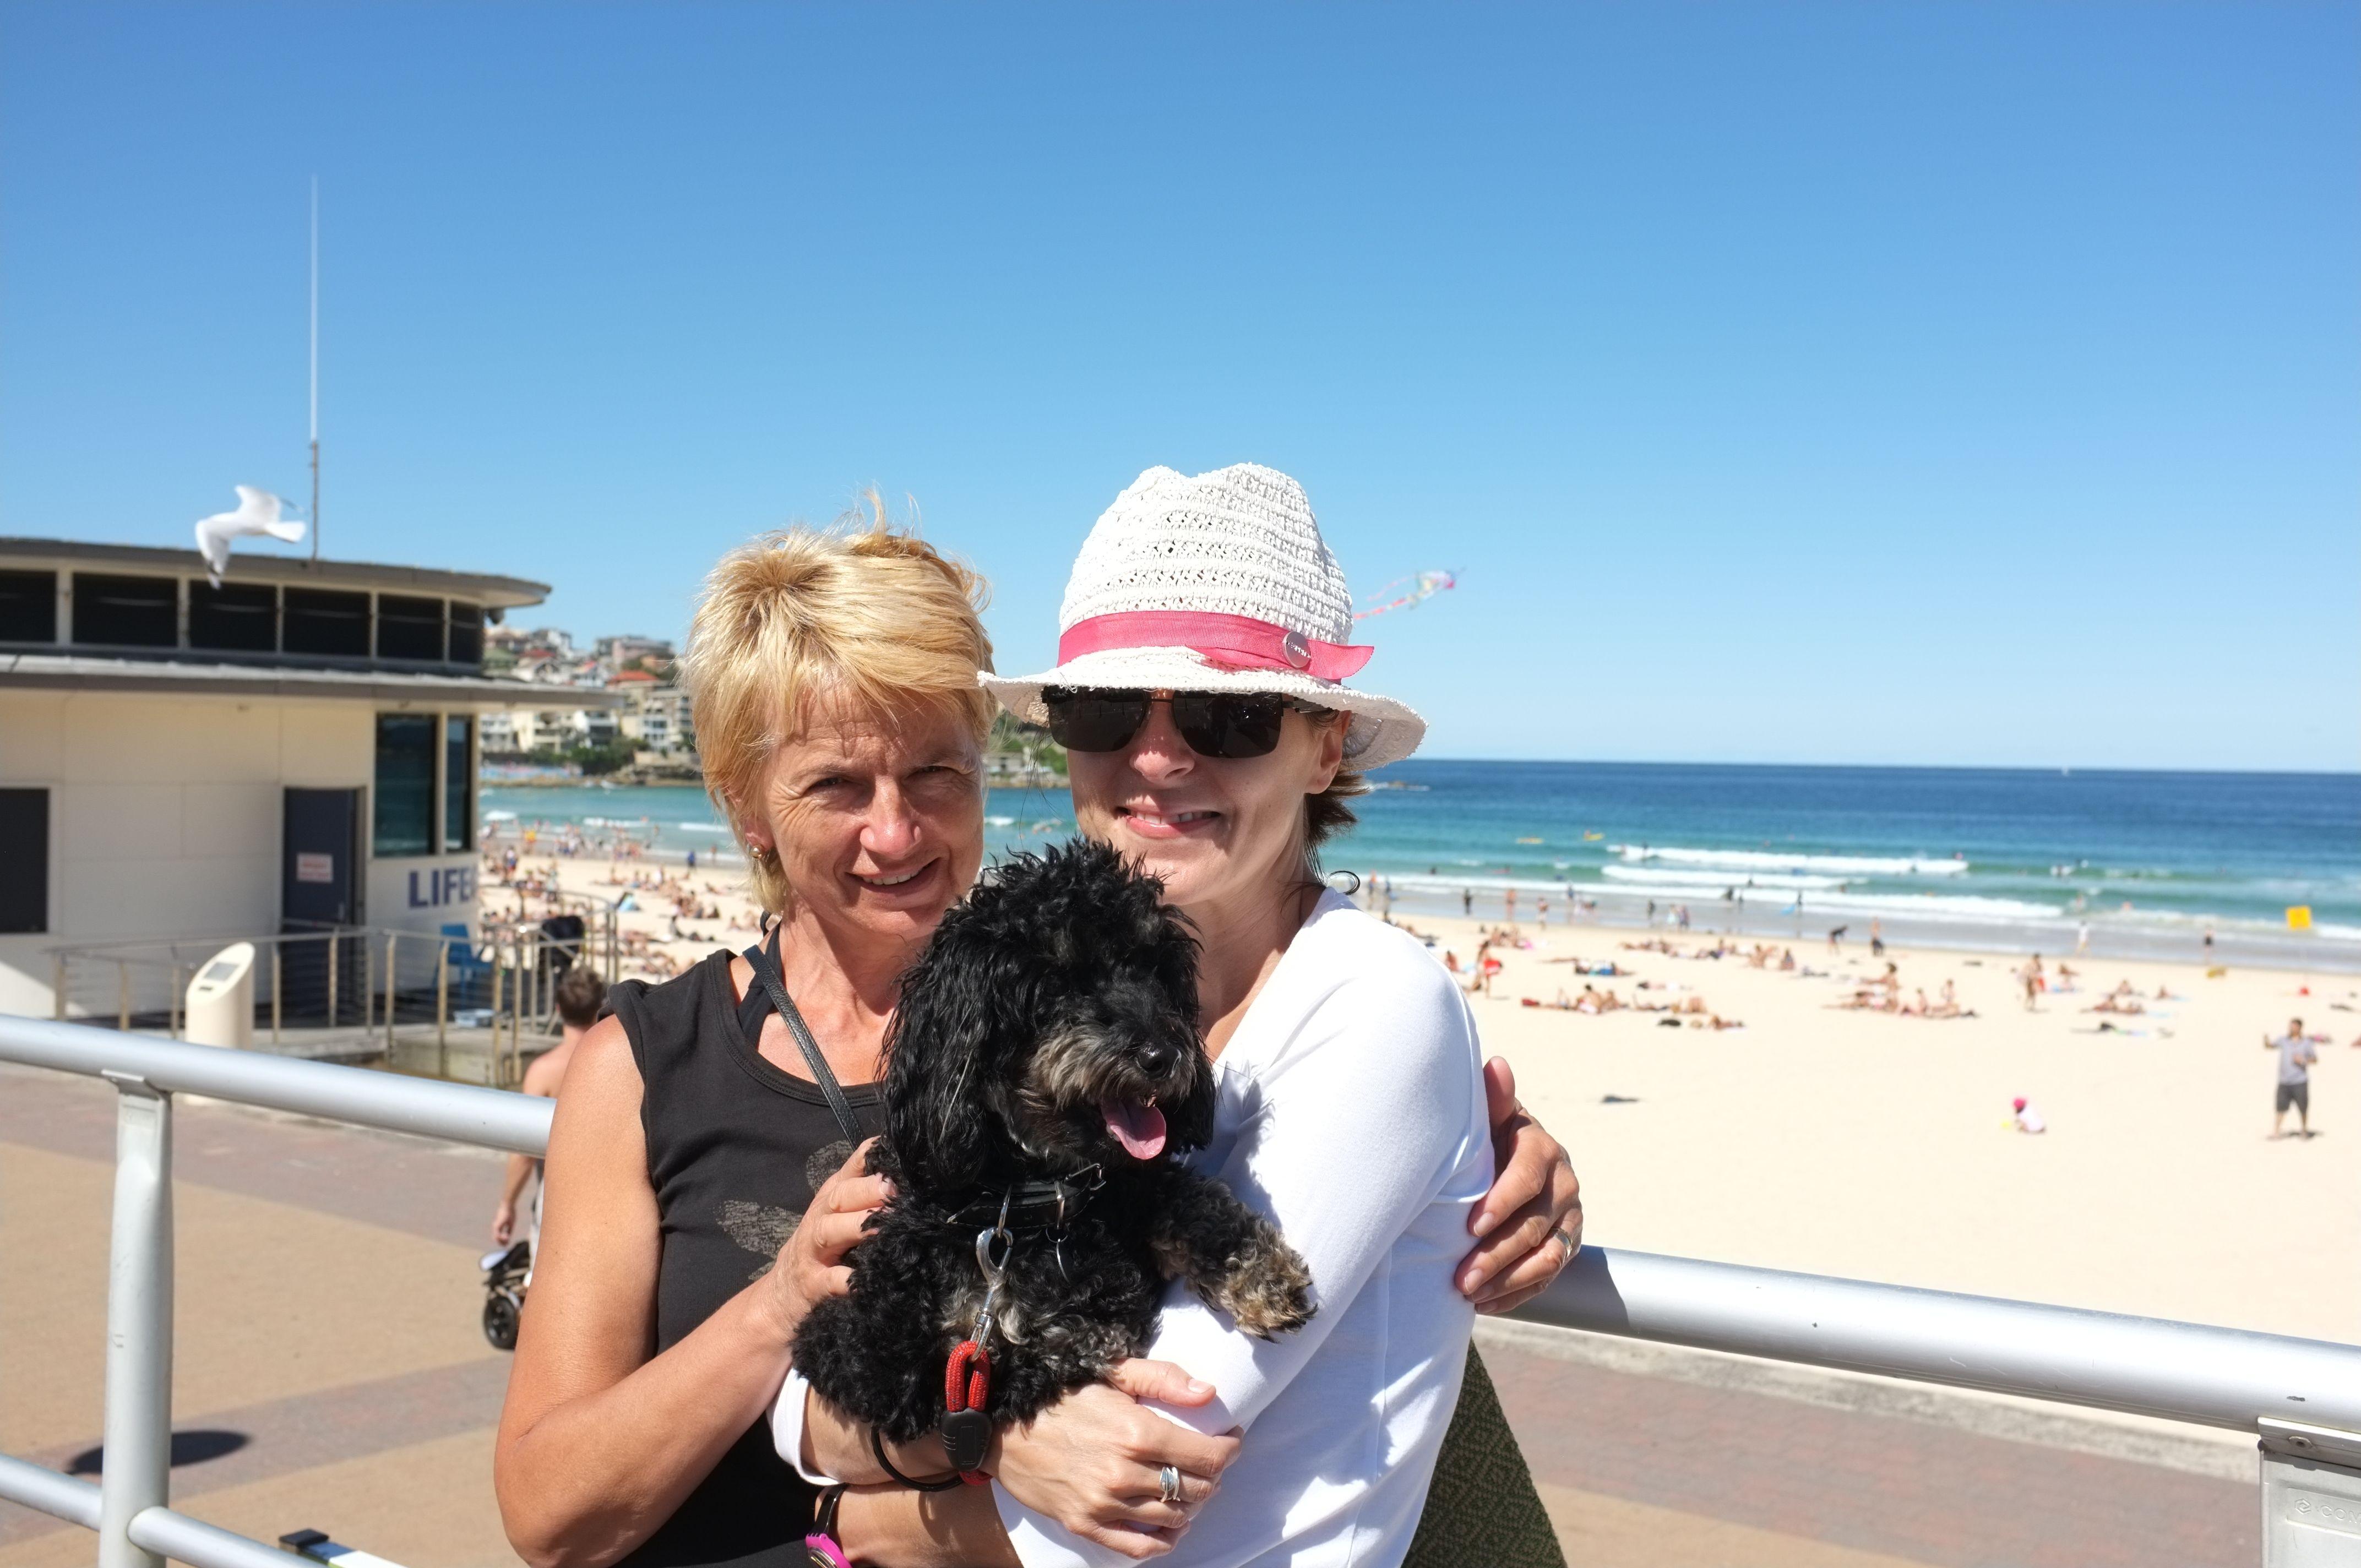 S tetou Evou a psíkom Maxim